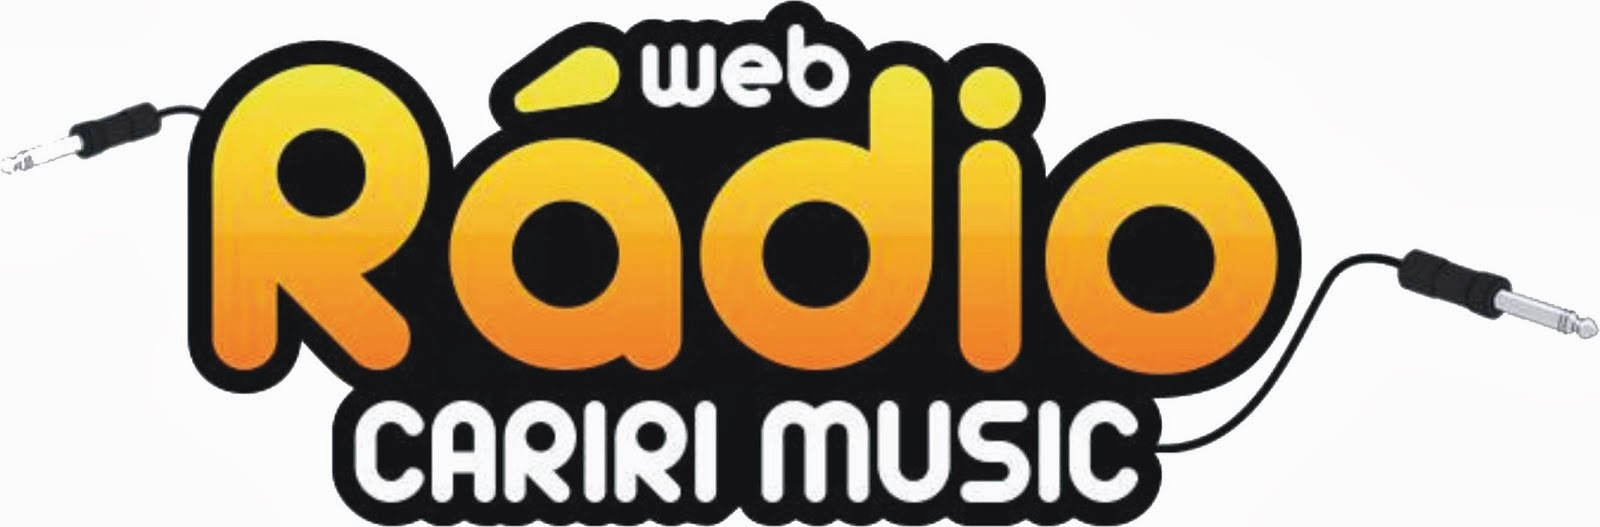 WEB RADIO CARIRI MUSIC